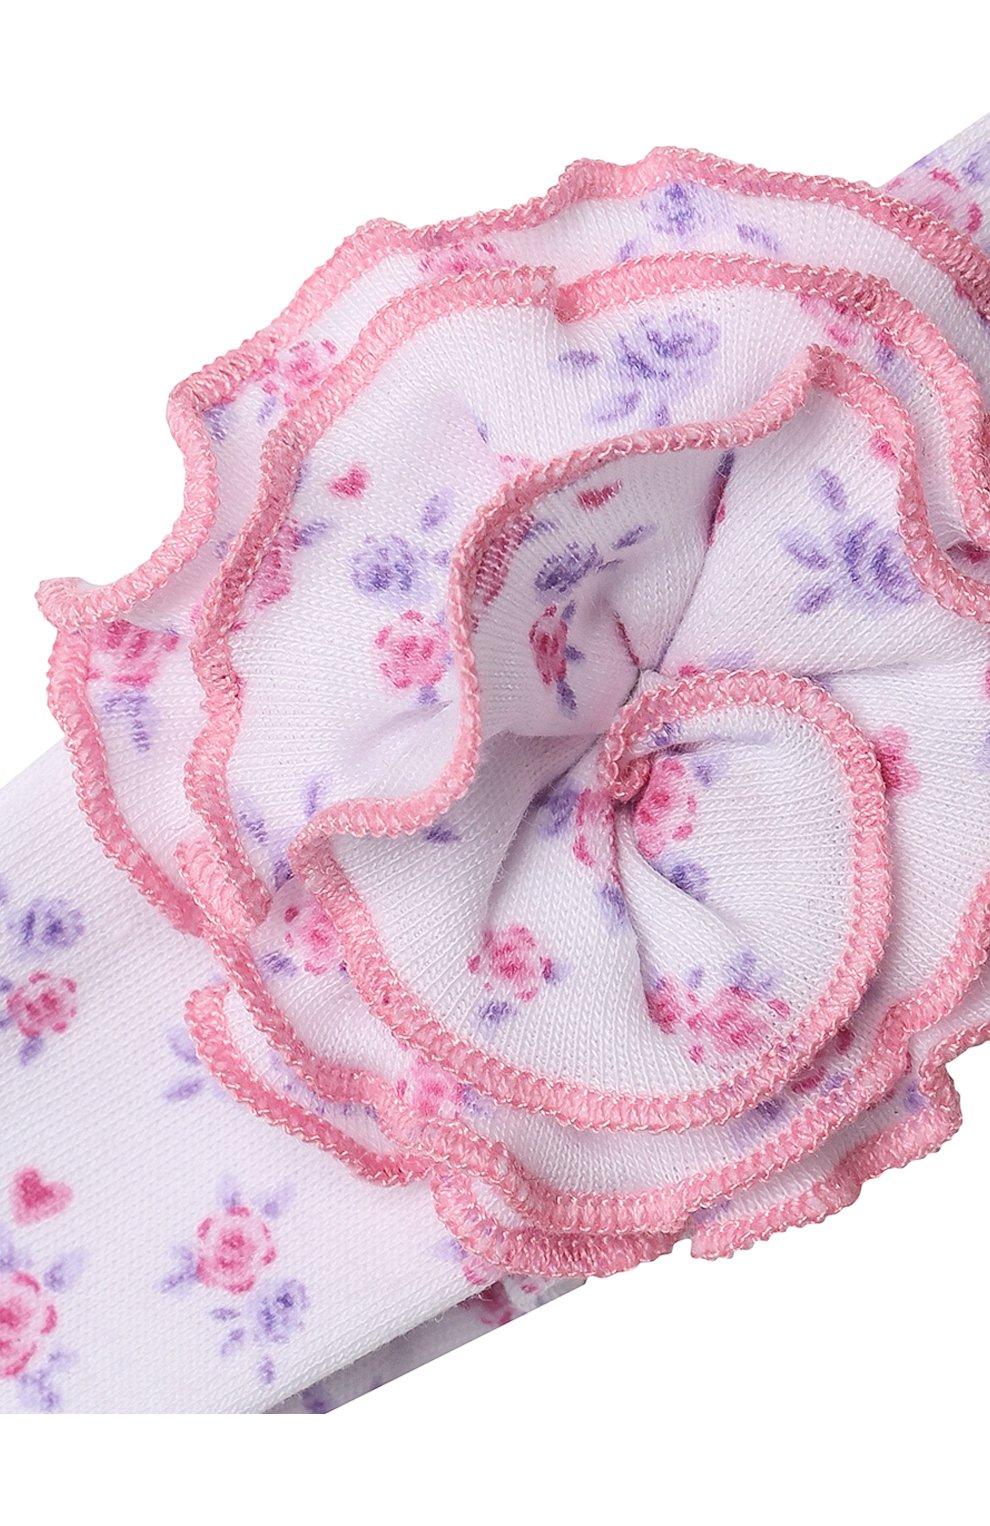 Детская повязка KISSY KISSY розового цвета, арт. KG5059190 | Фото 3 (Материал: Текстиль, Хлопок)